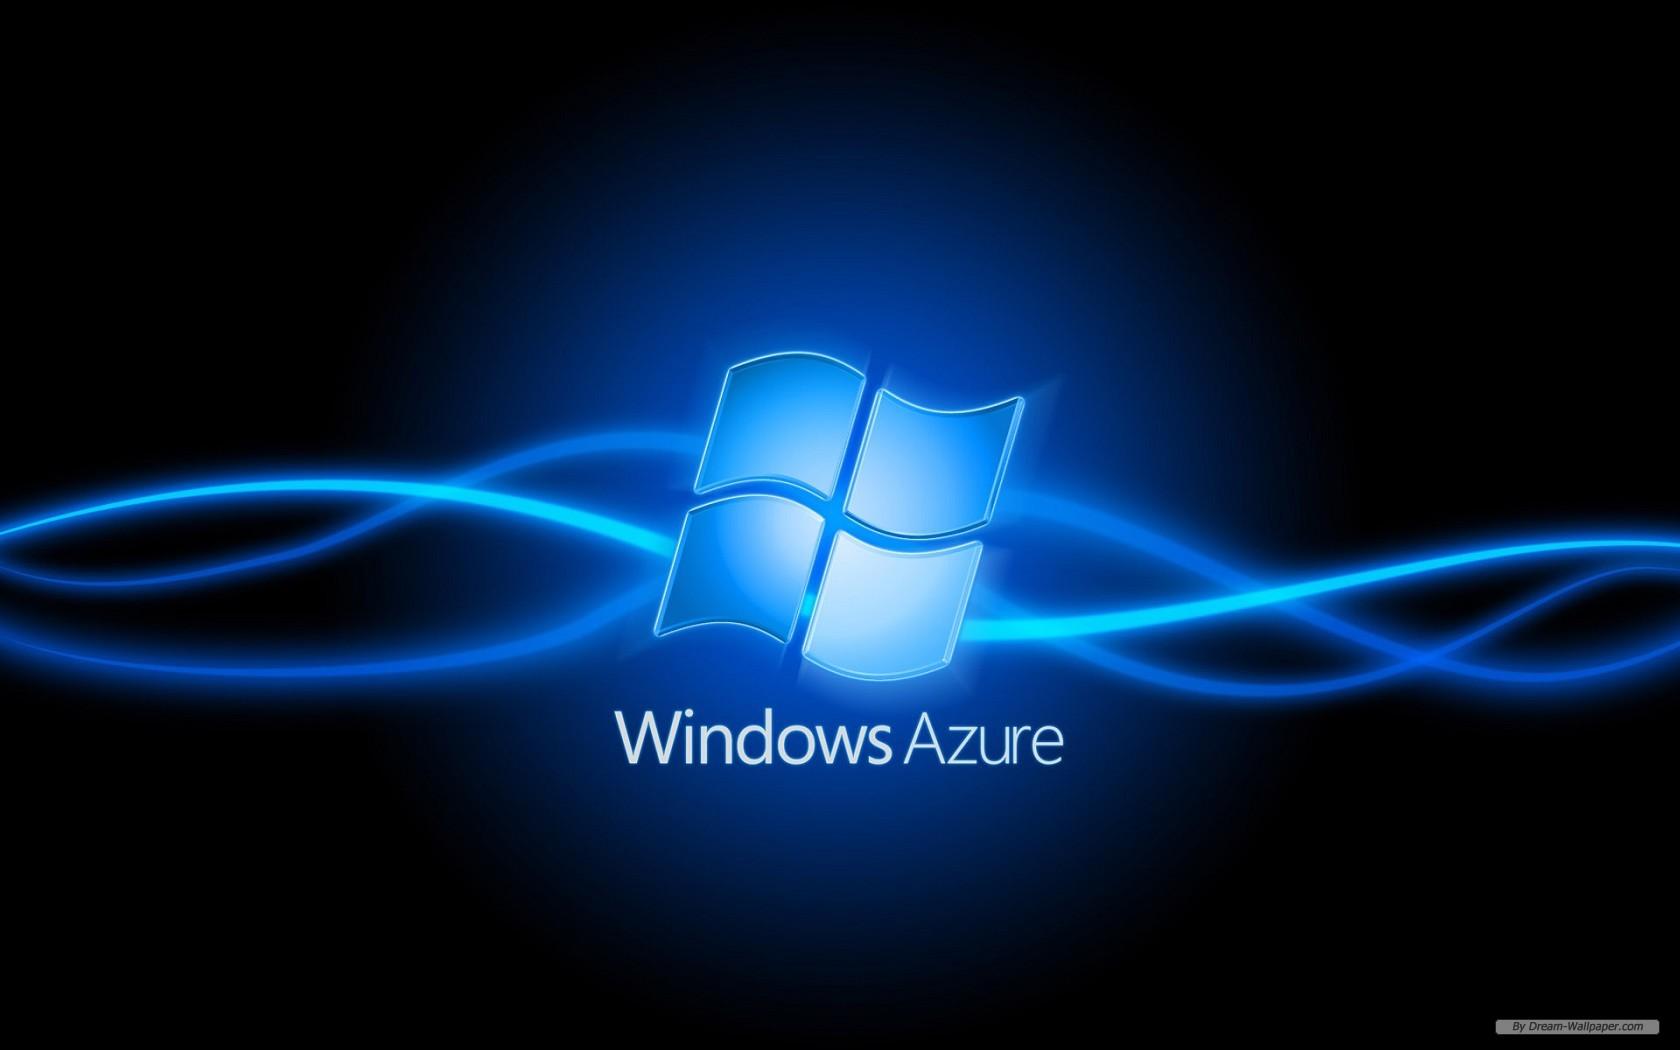 ... Windows7 Theme Wallpaper 1 wallpaper - 1680x1050 wallpaper - Index 10